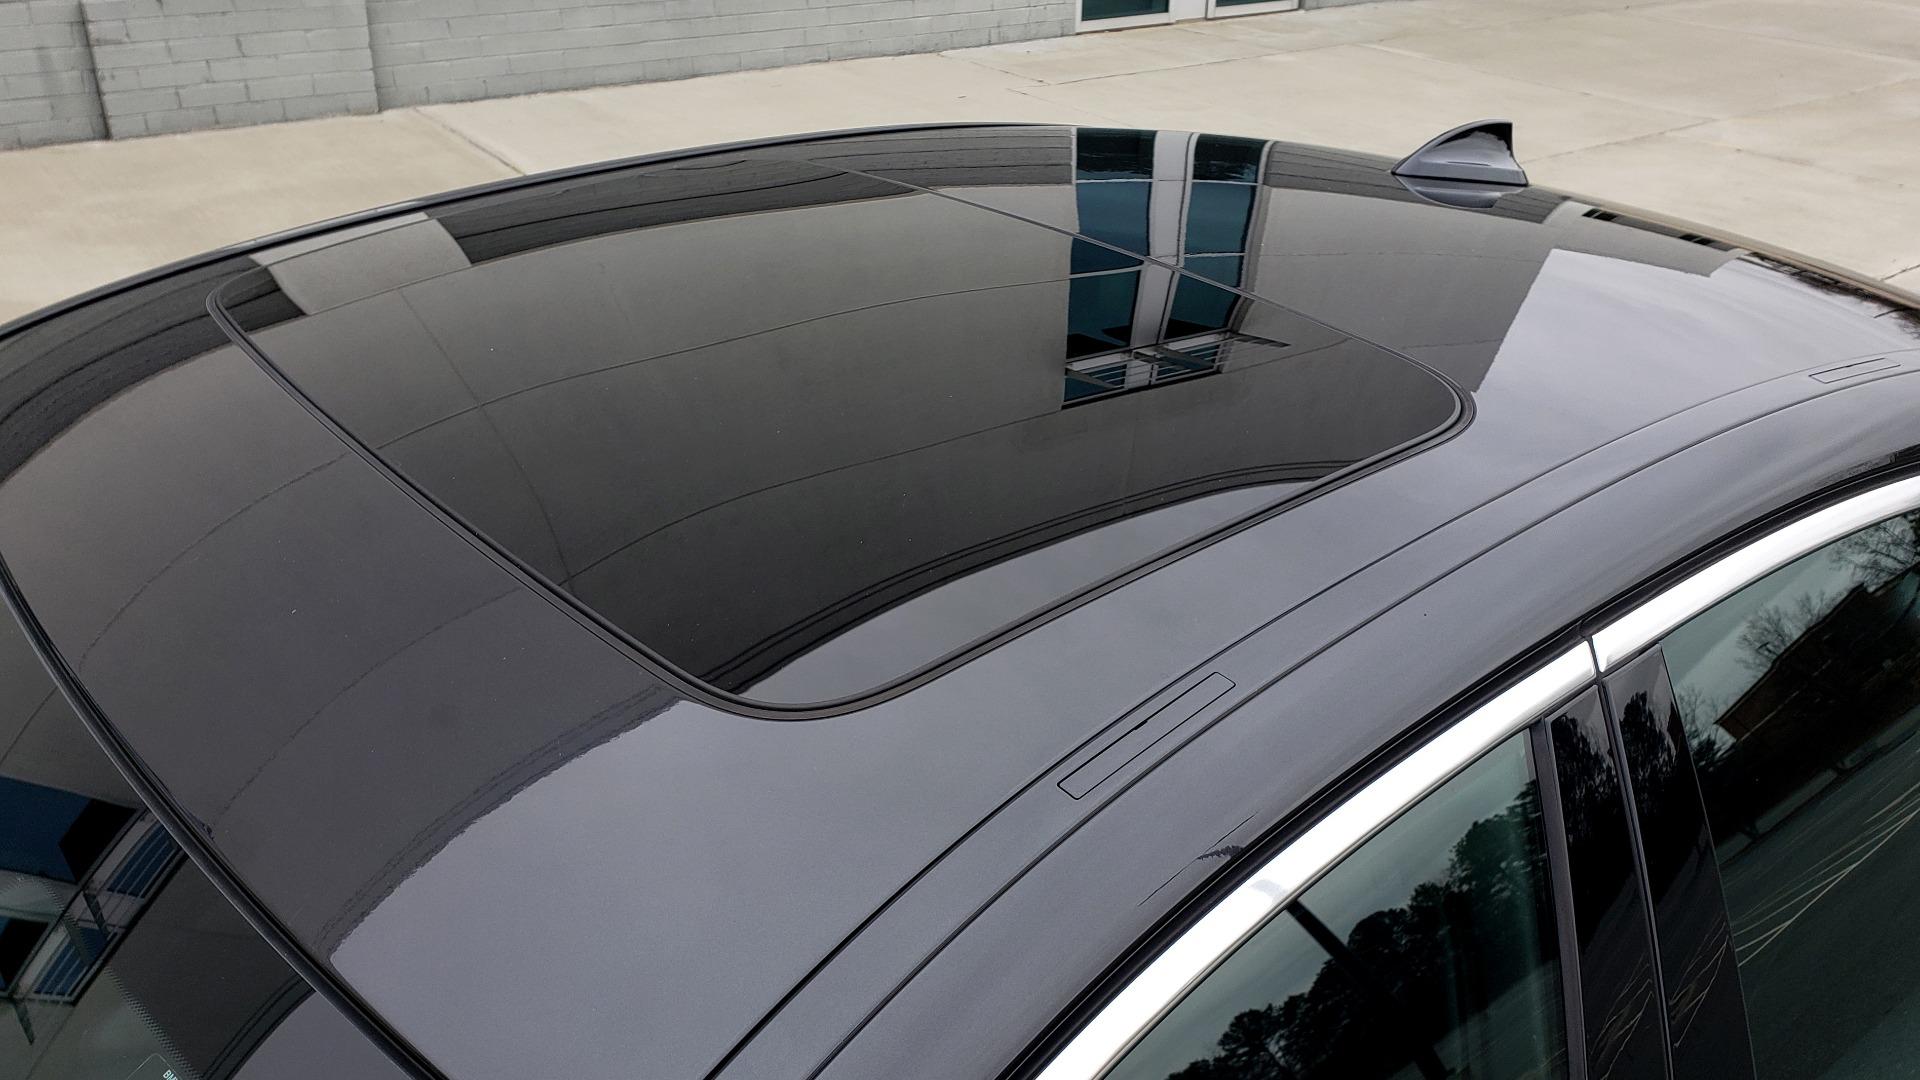 Used 2017 BMW 5 SERIES 530IXDRIVE / PREM PKG / DRVR ASST PLUS / CLD WTHR / APPLE CARPLAY for sale Sold at Formula Imports in Charlotte NC 28227 8